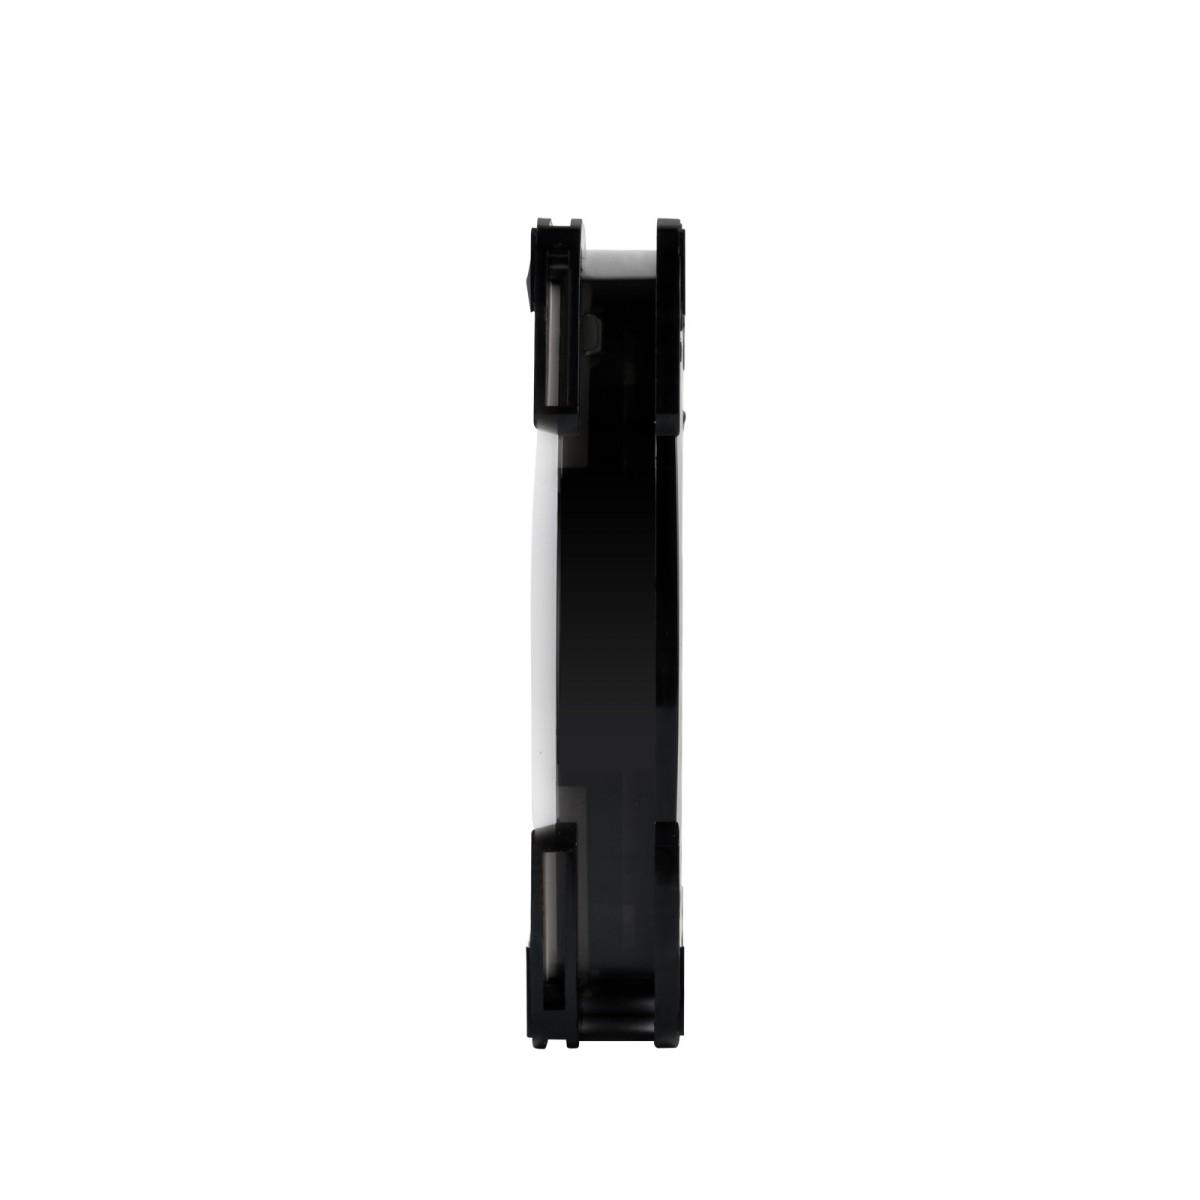 Cooler para Gabinete SilverStone AP124-ARGB, 120mm, SST-AP124-ARGB